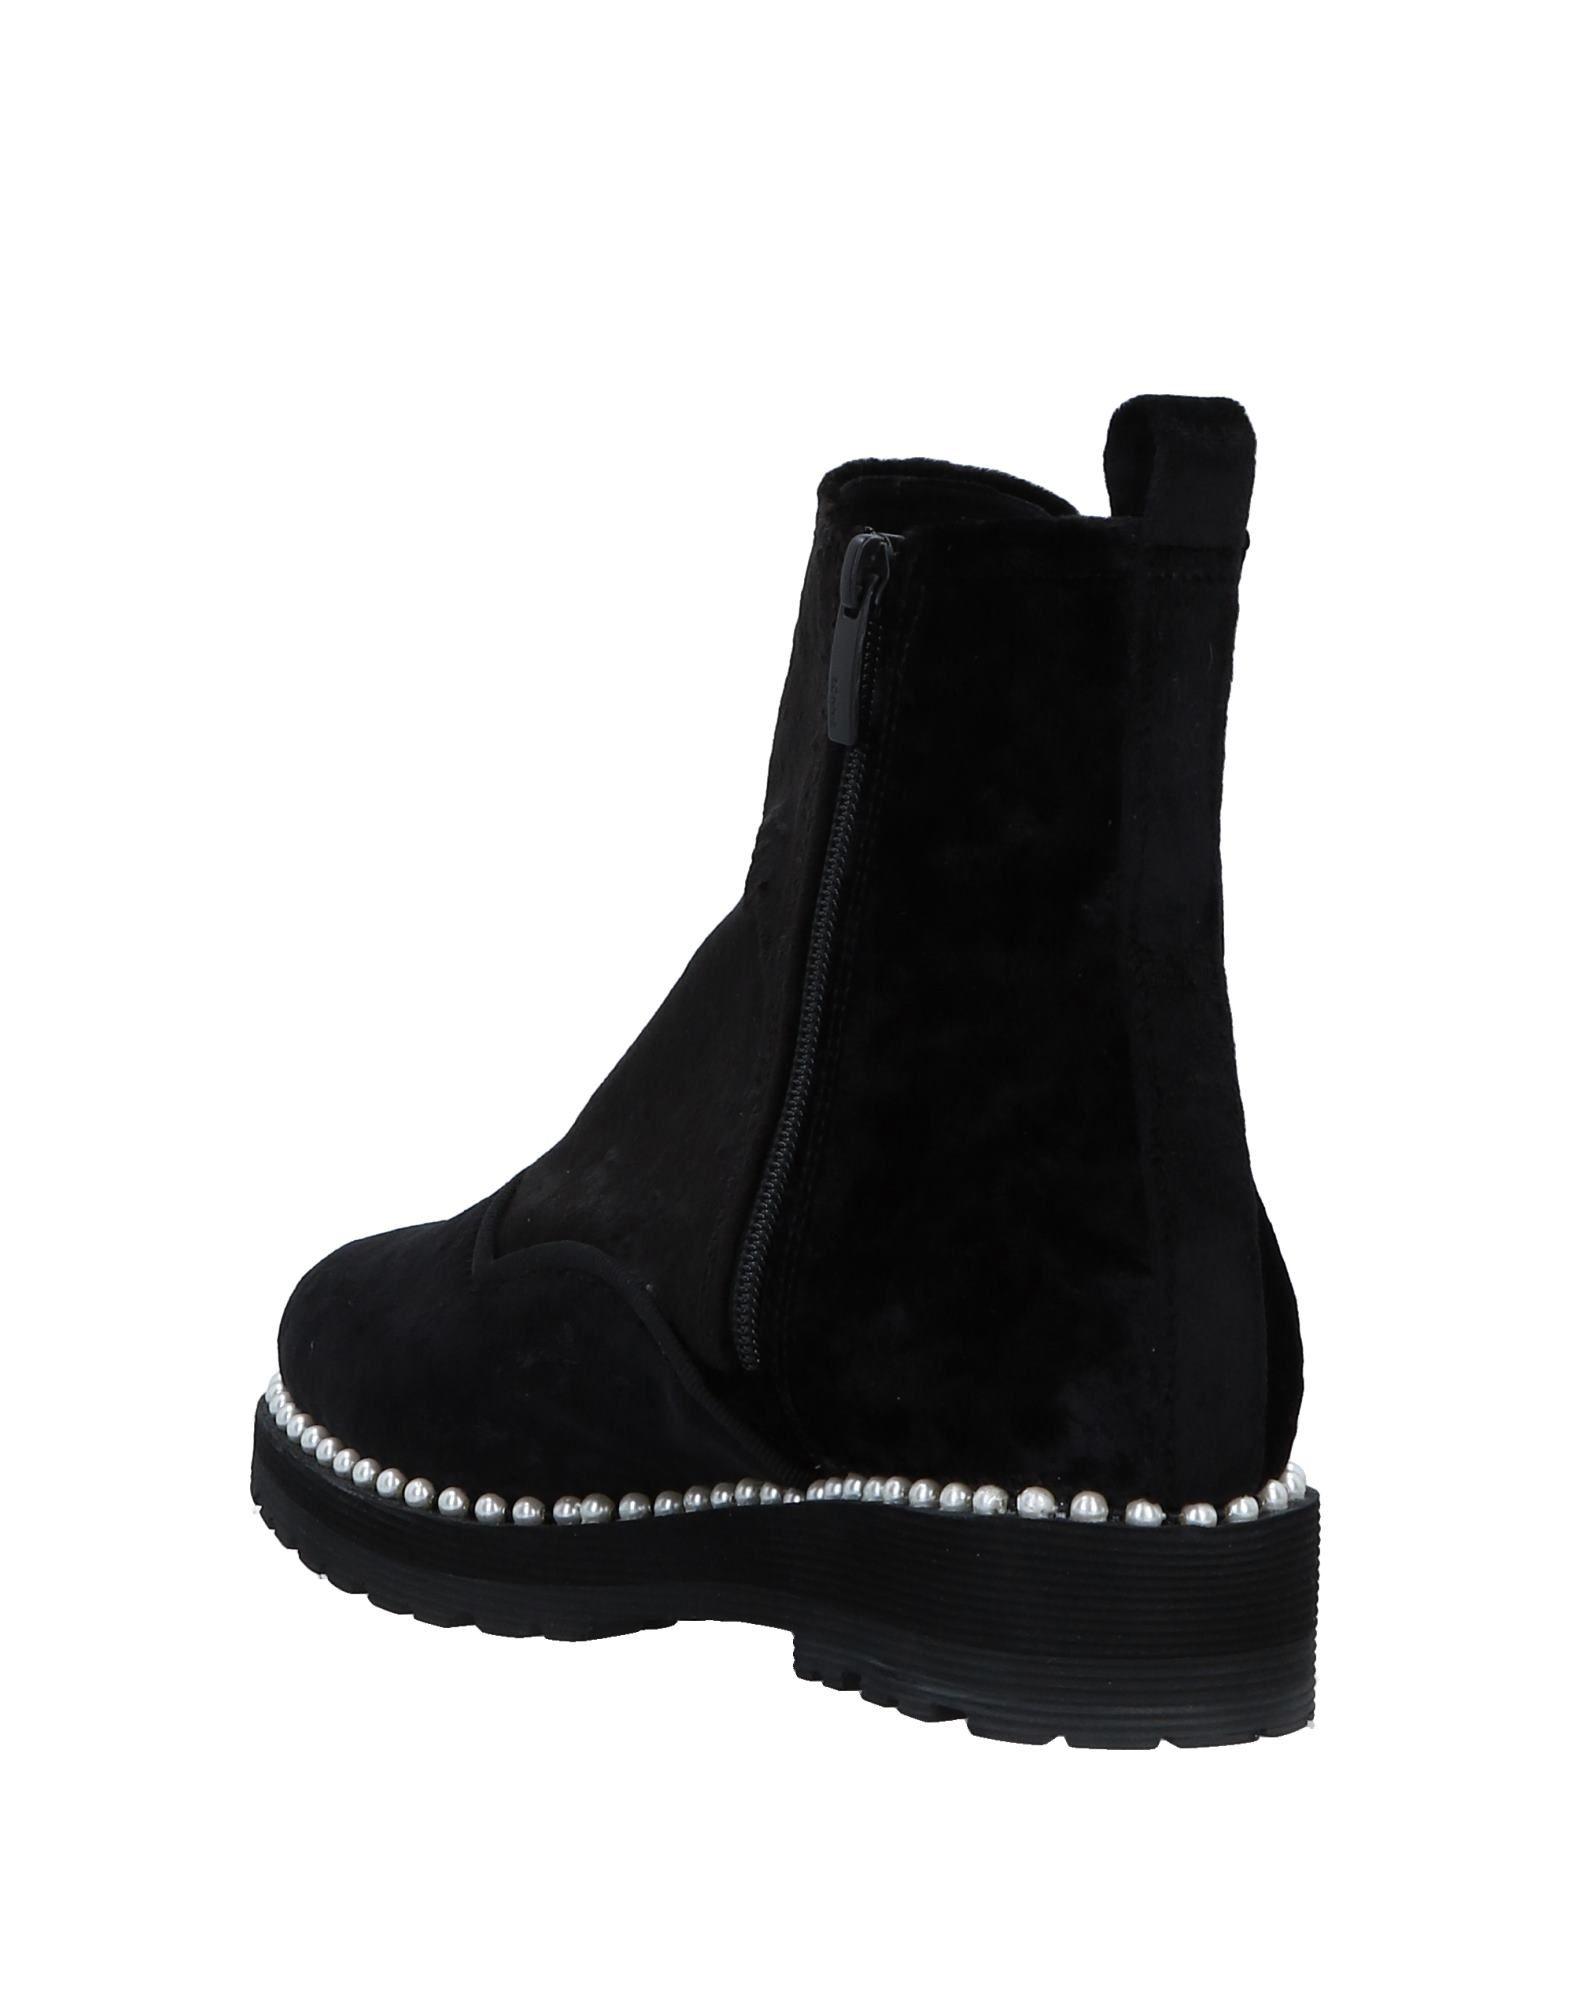 Suecomma Bonnie Stiefelette Damen strapazierfähige  11516279LEGut aussehende strapazierfähige Damen Schuhe 0b2ba8